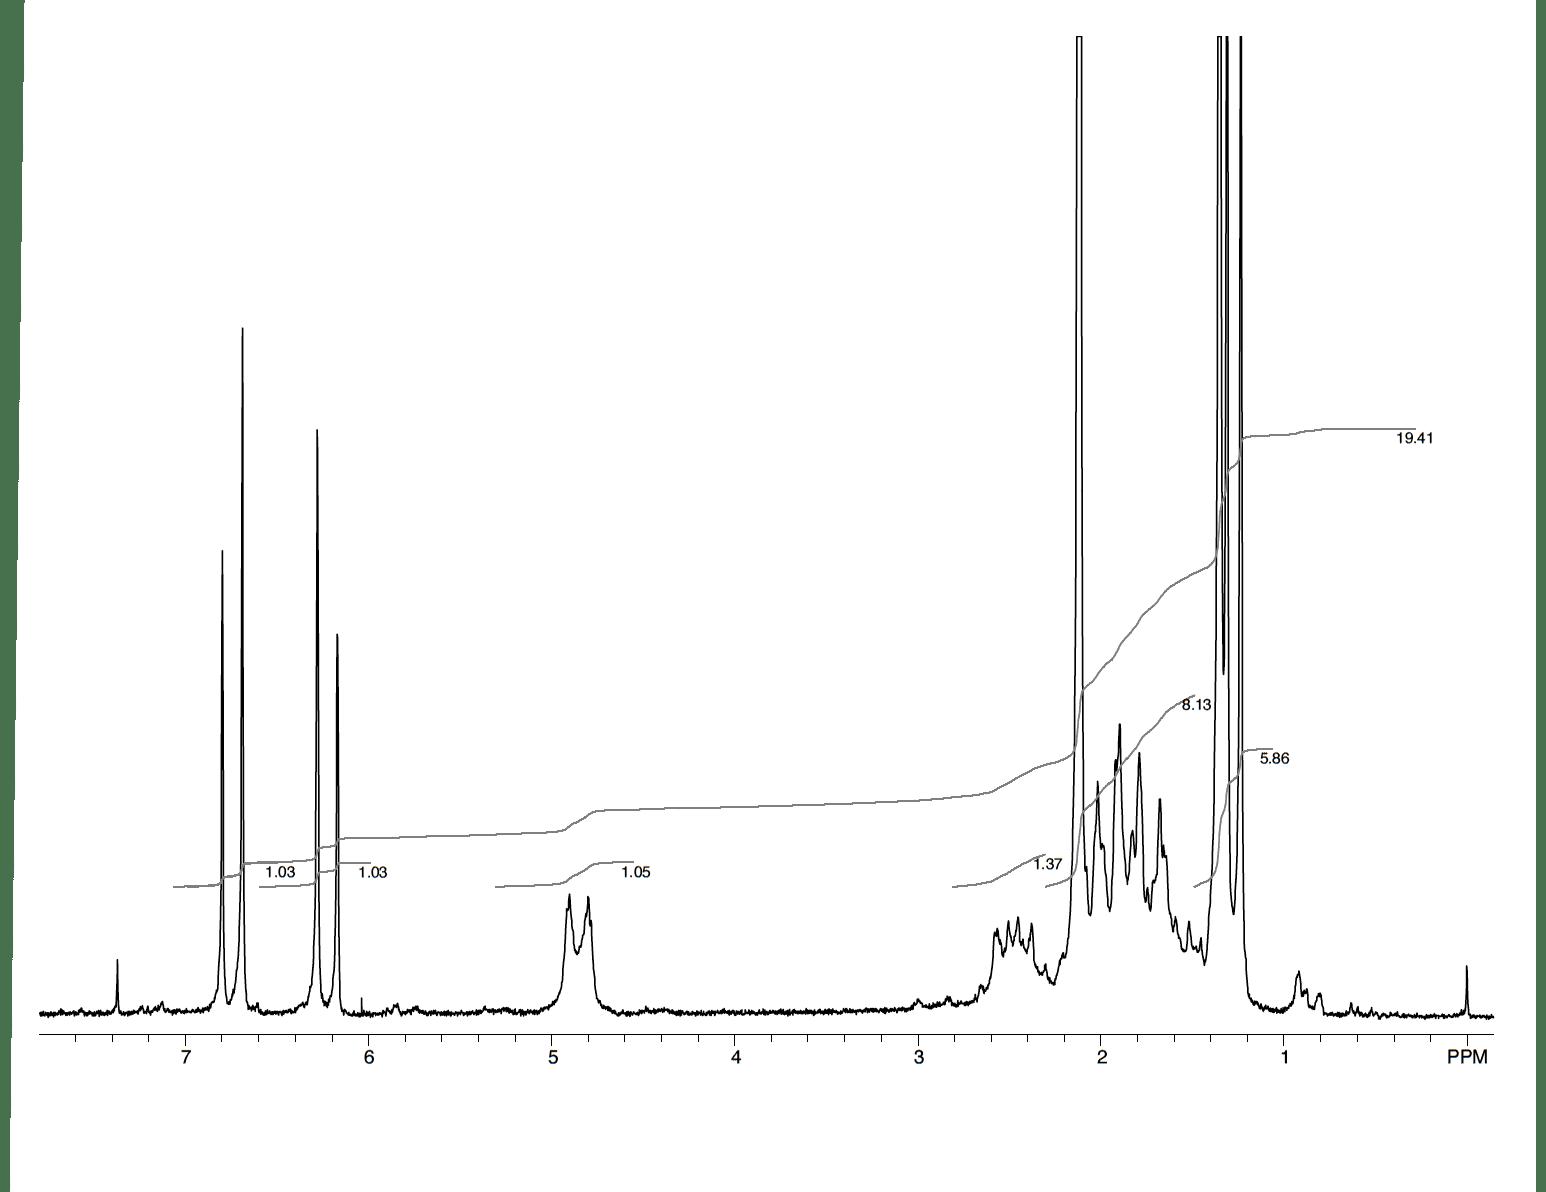 Anasazi Instruments 1H spectrum Santonin graph